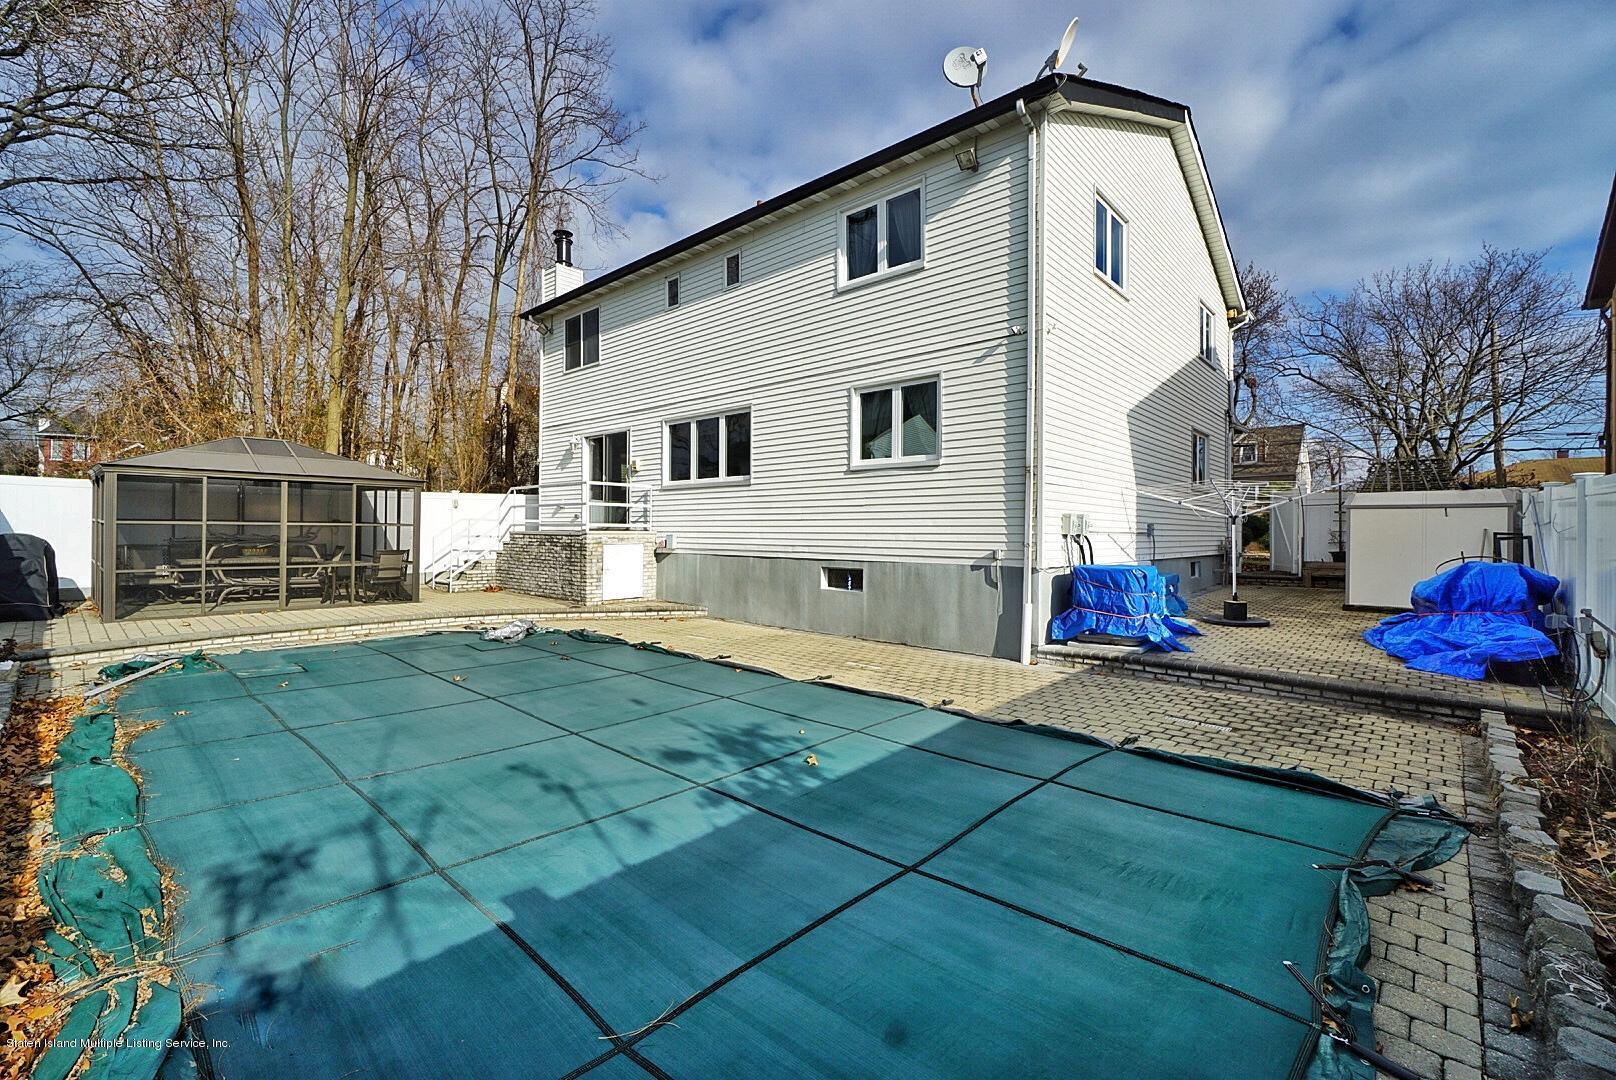 Two Family - Detached 360 Main Street  Staten Island, NY 10307, MLS-1124744-50